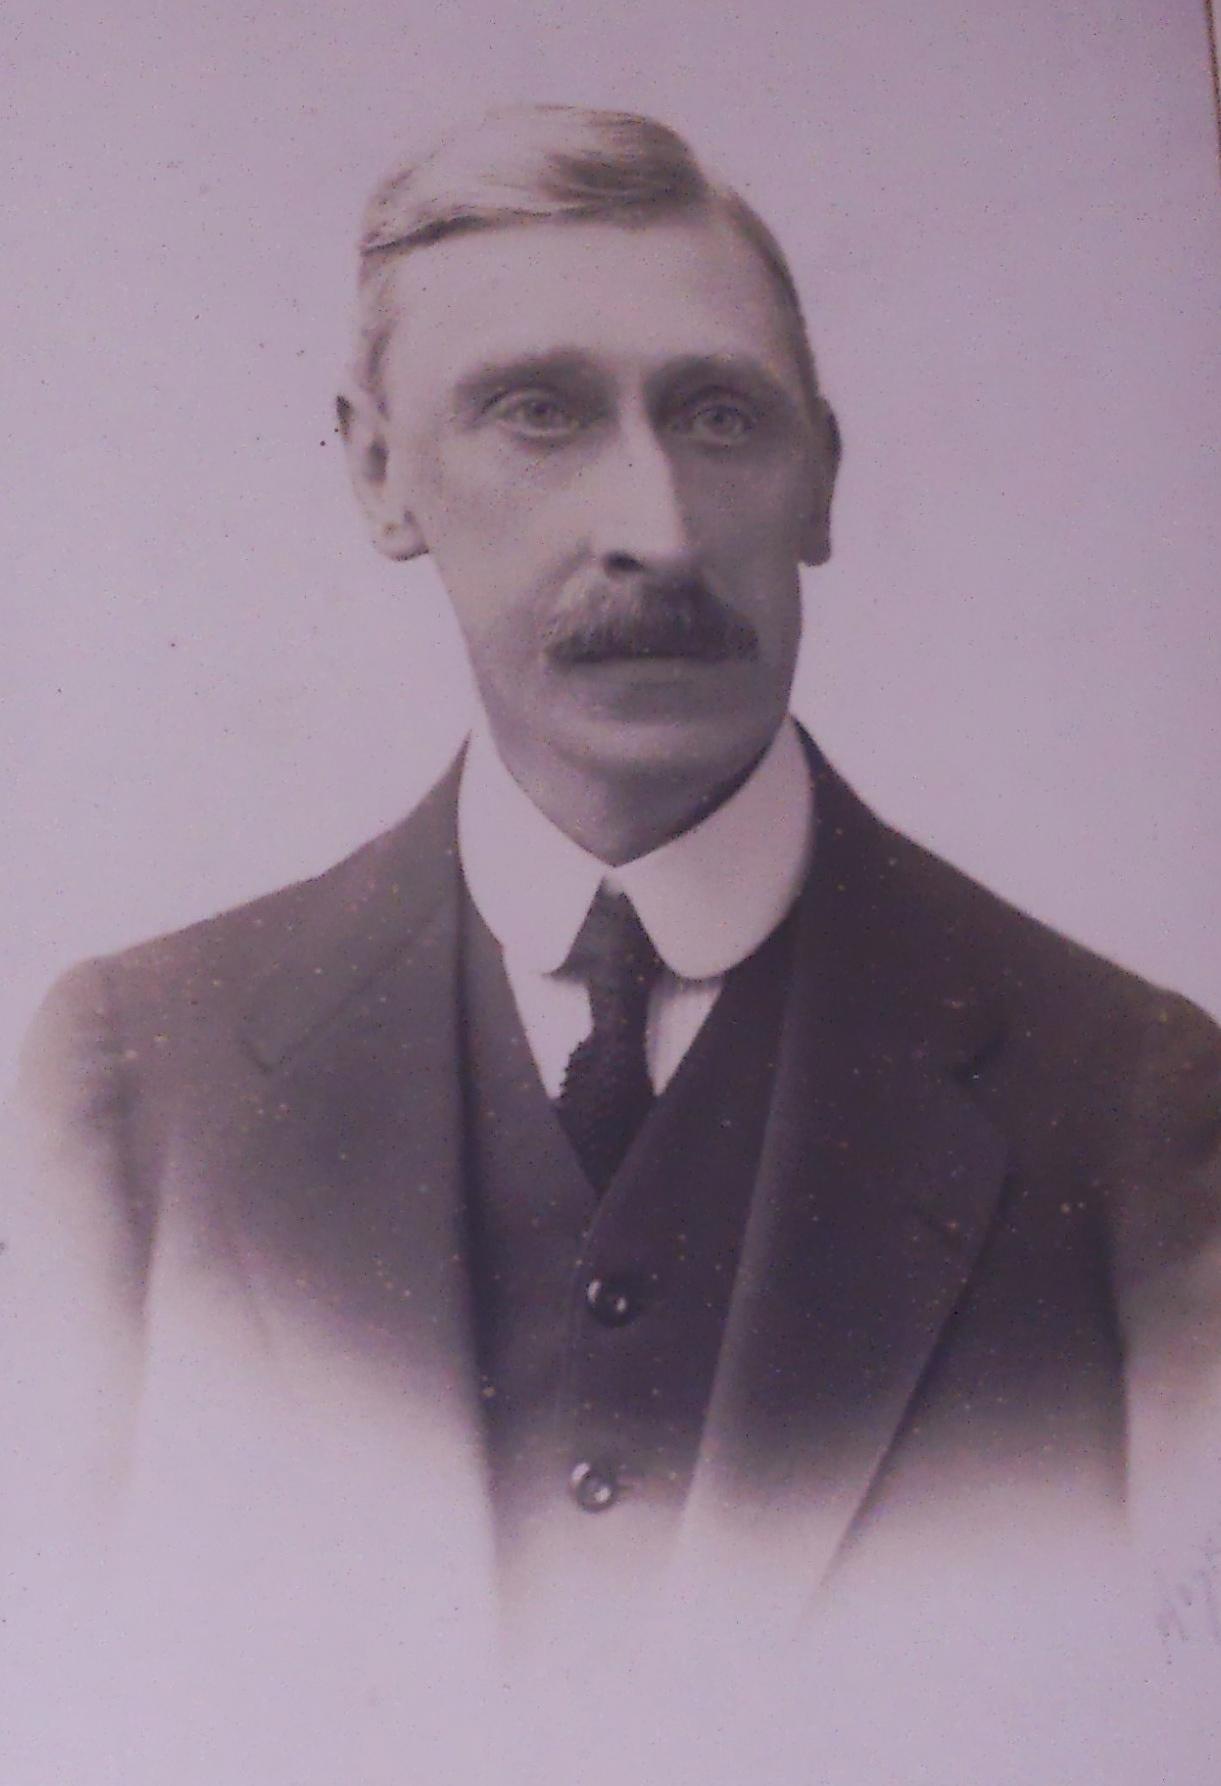 Patrick Joseph Duckett